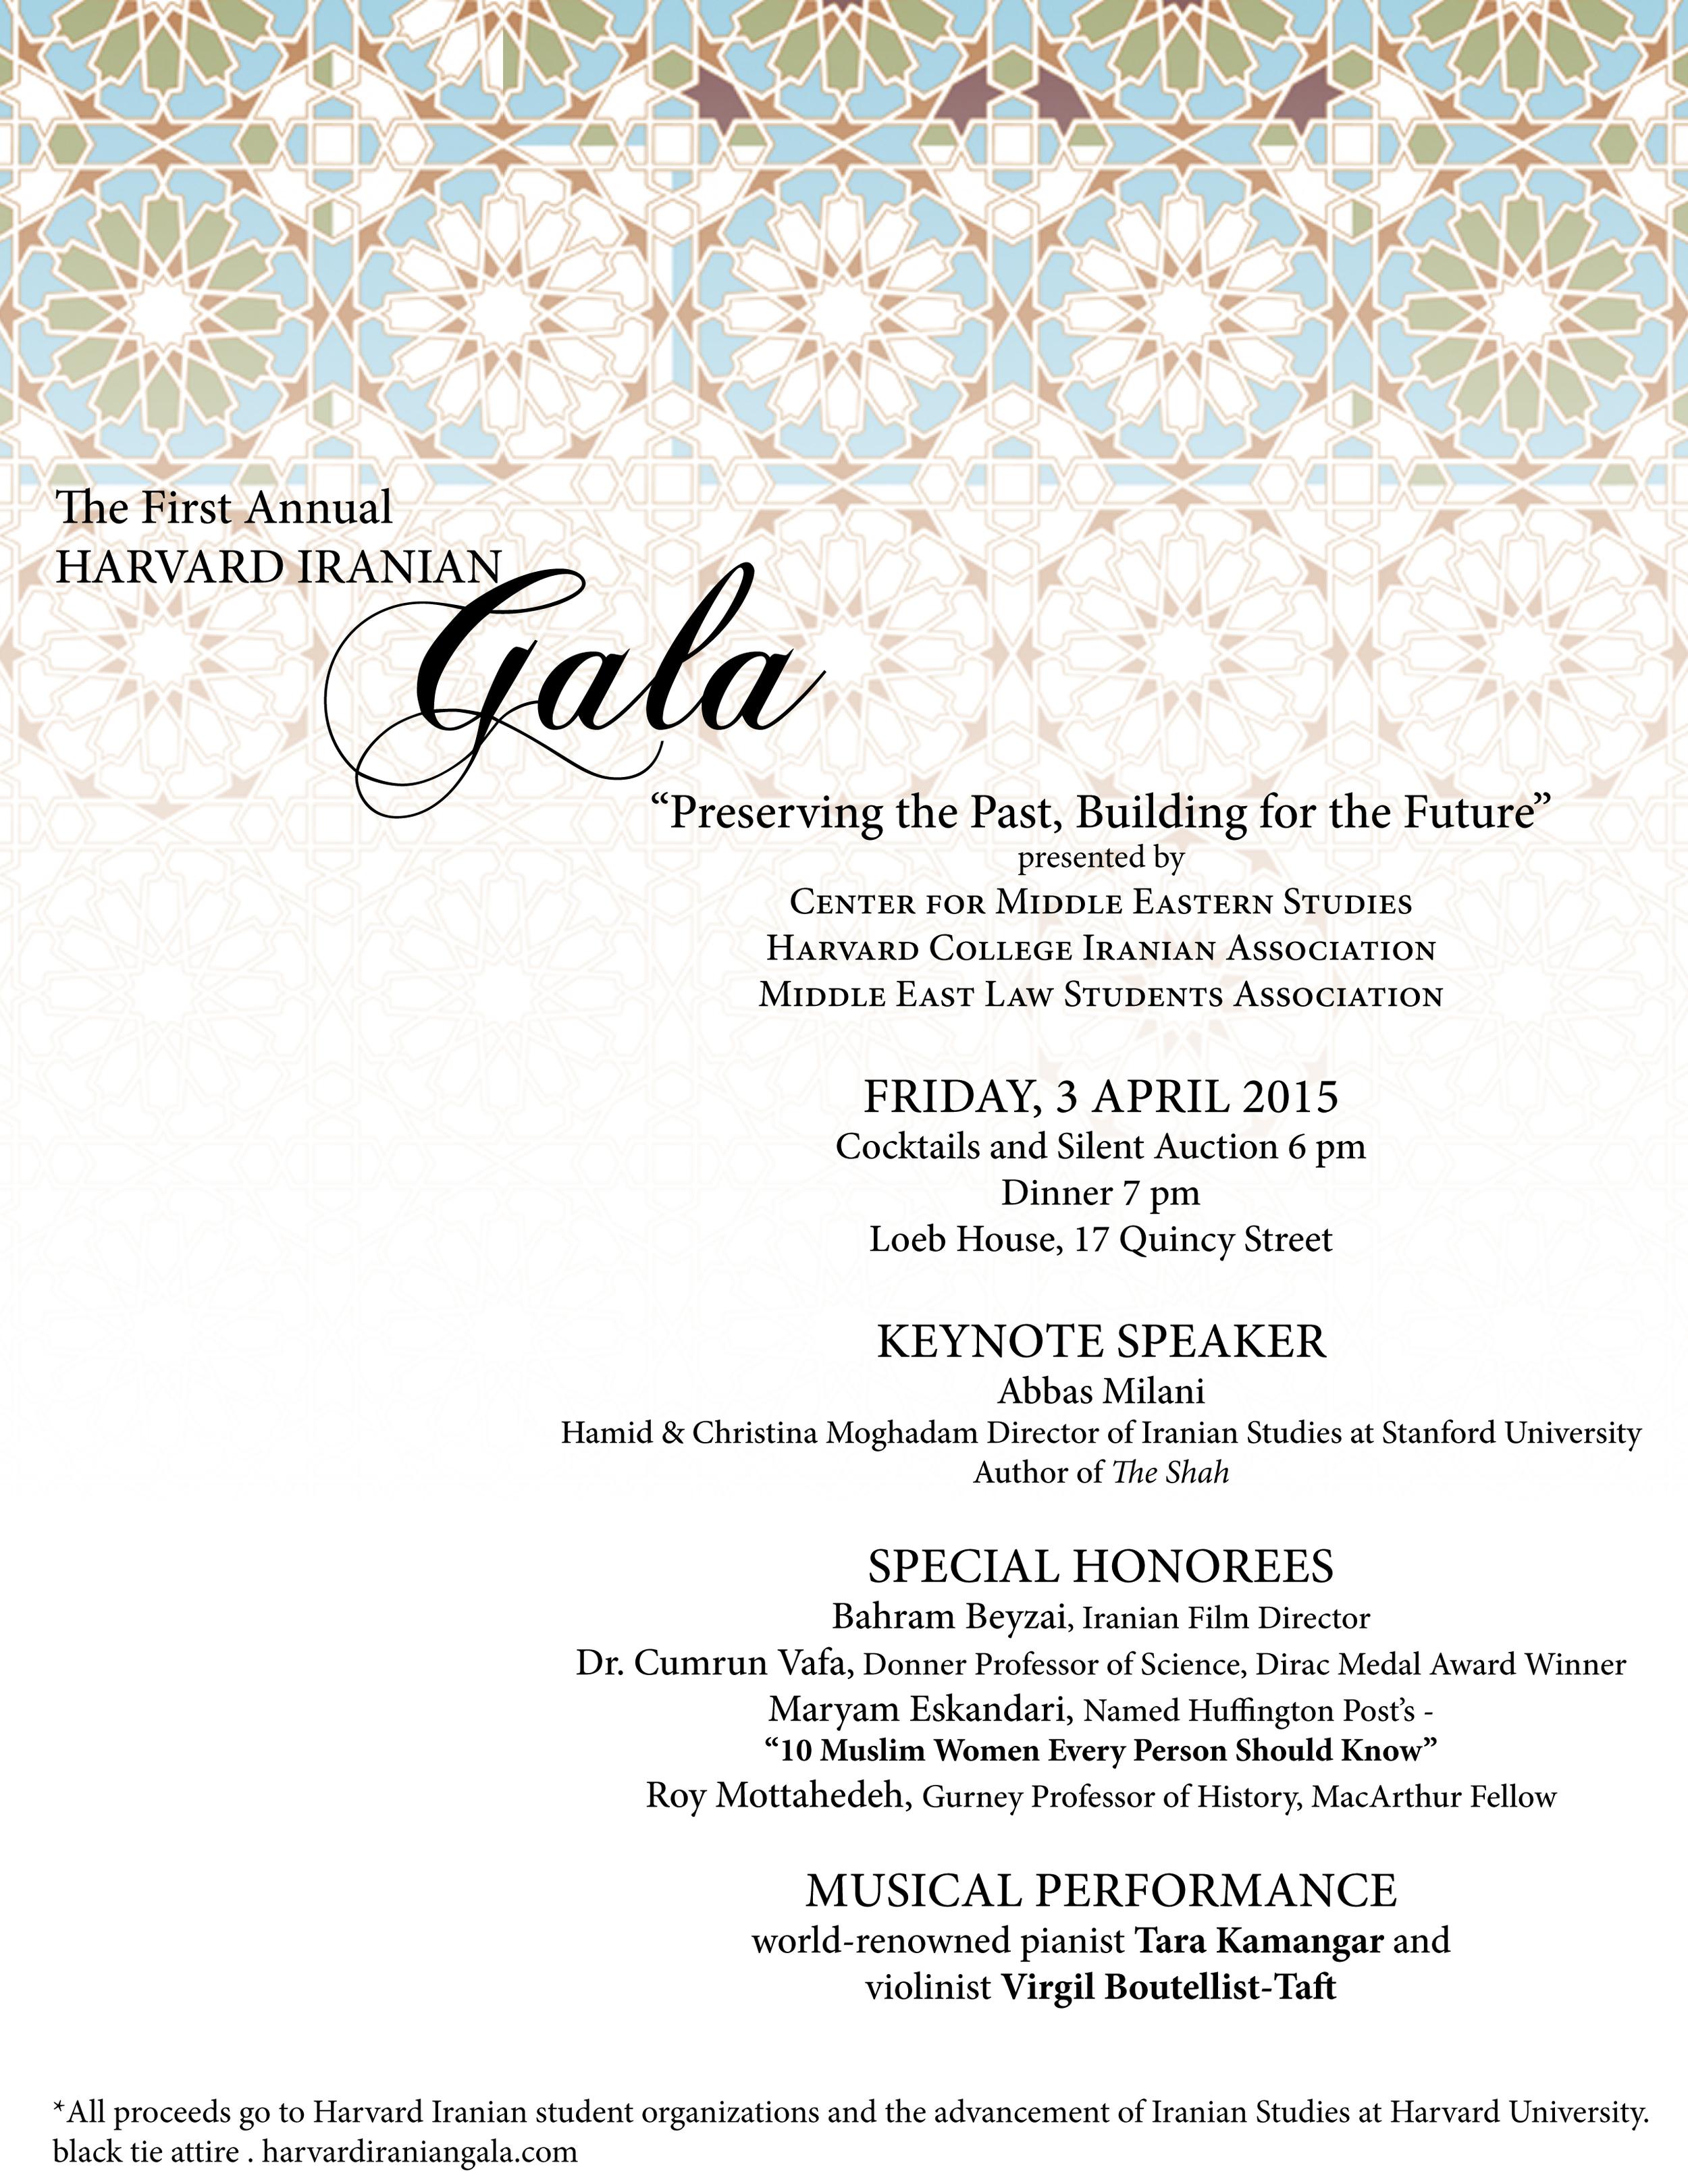 MIIM Designs Harvard Gala